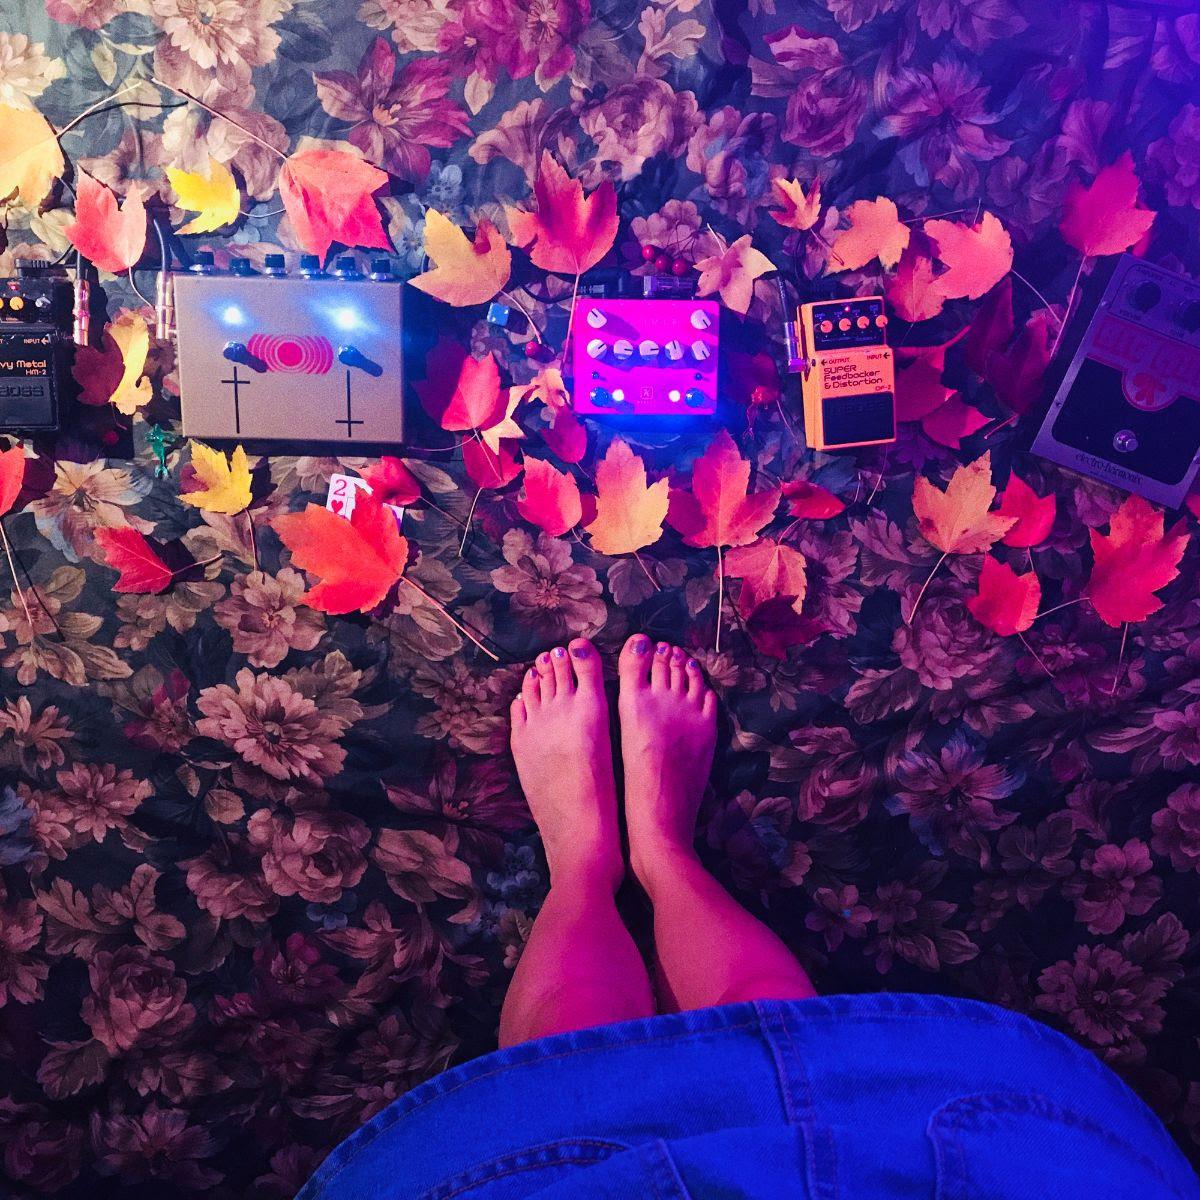 Kidbug supergroup self-titled album cover